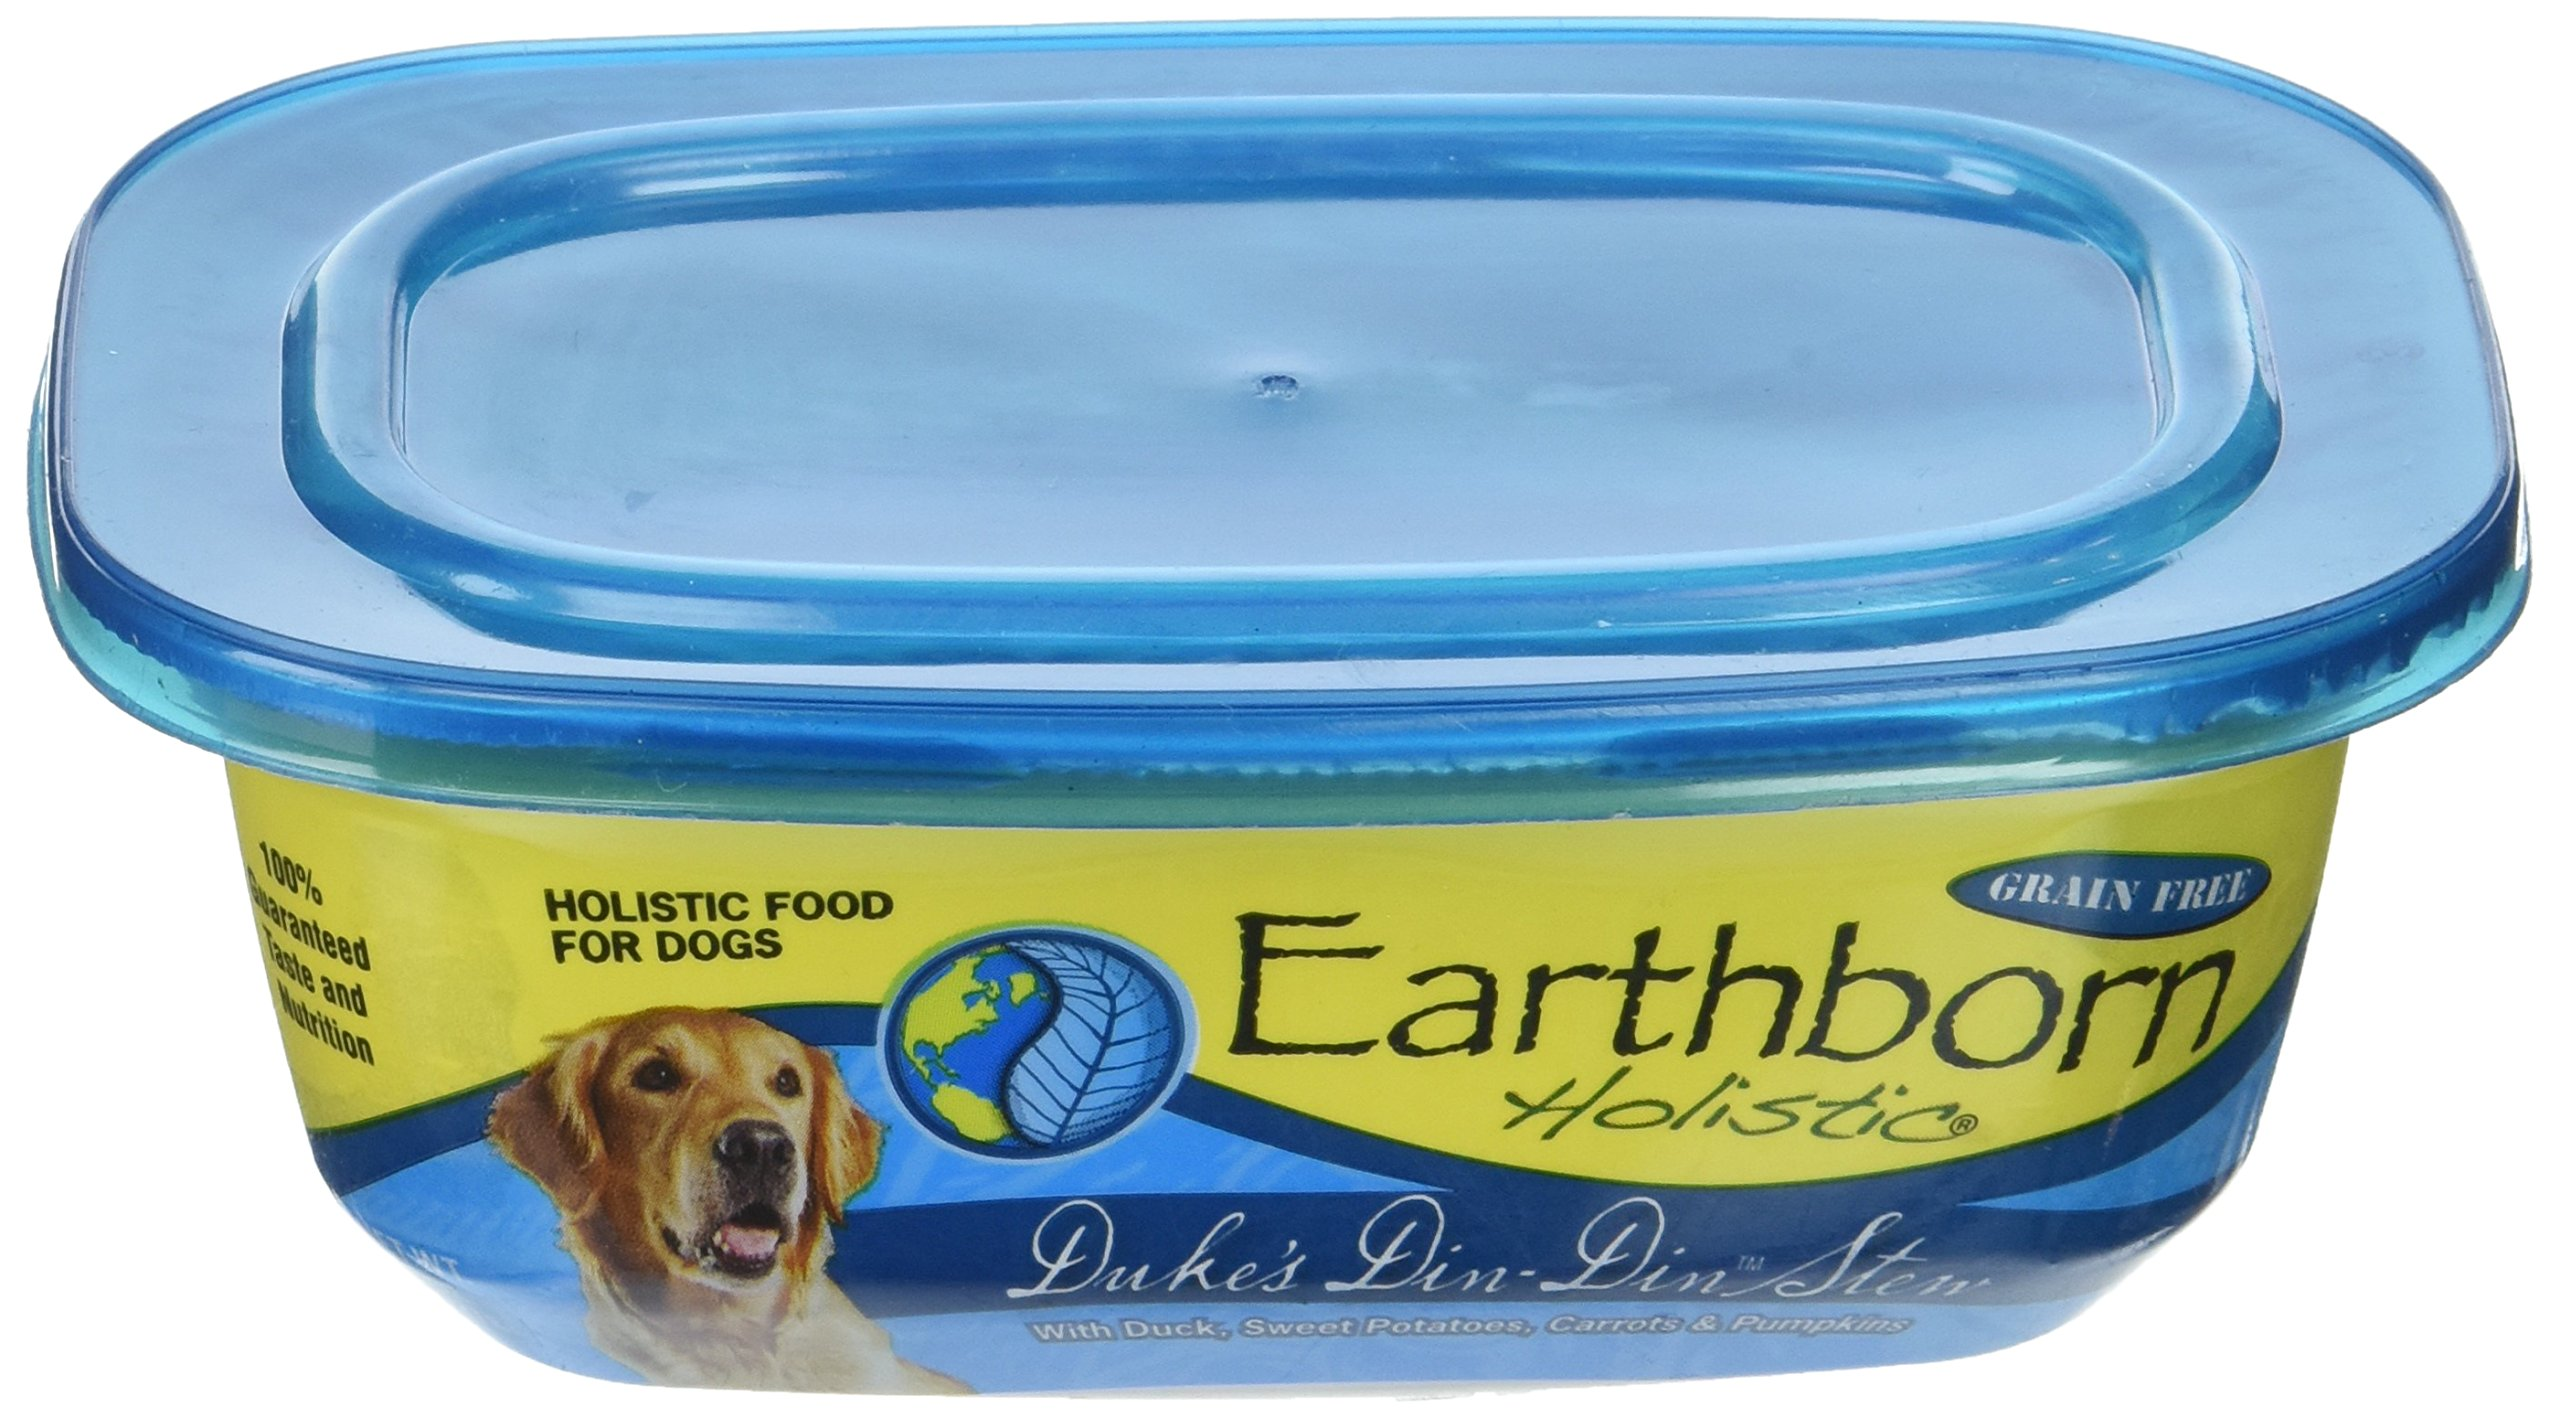 Earthborn Holistic Duke'S Din-Din Stew Grain Free Moist Dog Food, 8 Oz, Case Of 8